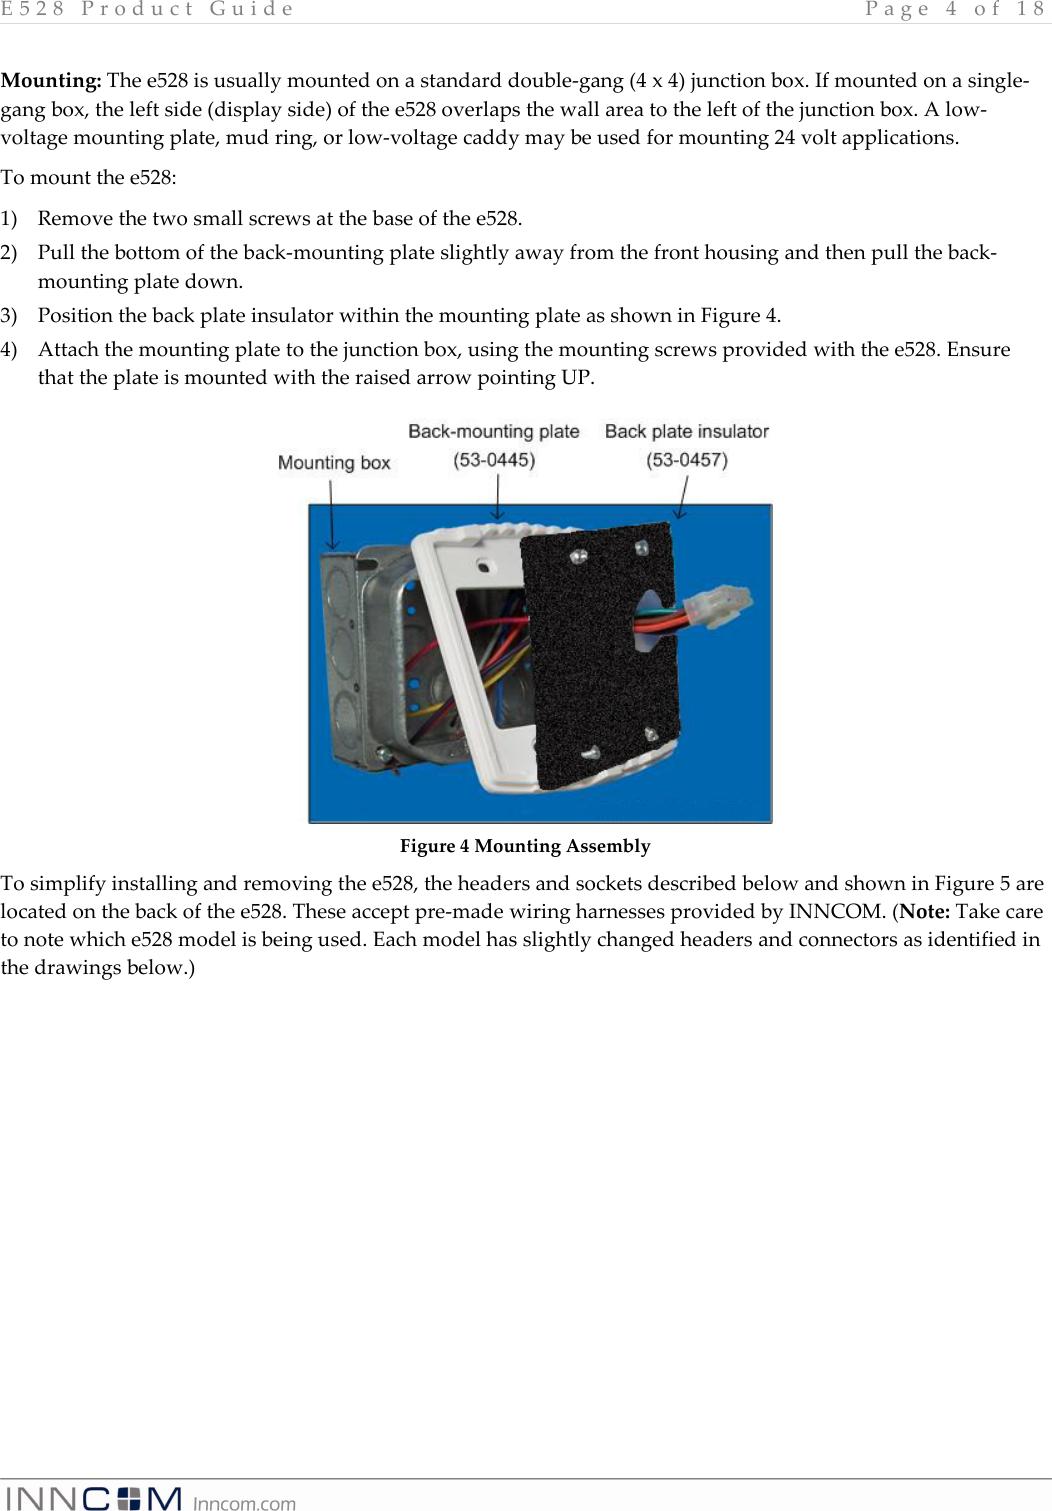 inncom 202150txr thermostat user manual e528 product guide. Black Bedroom Furniture Sets. Home Design Ideas